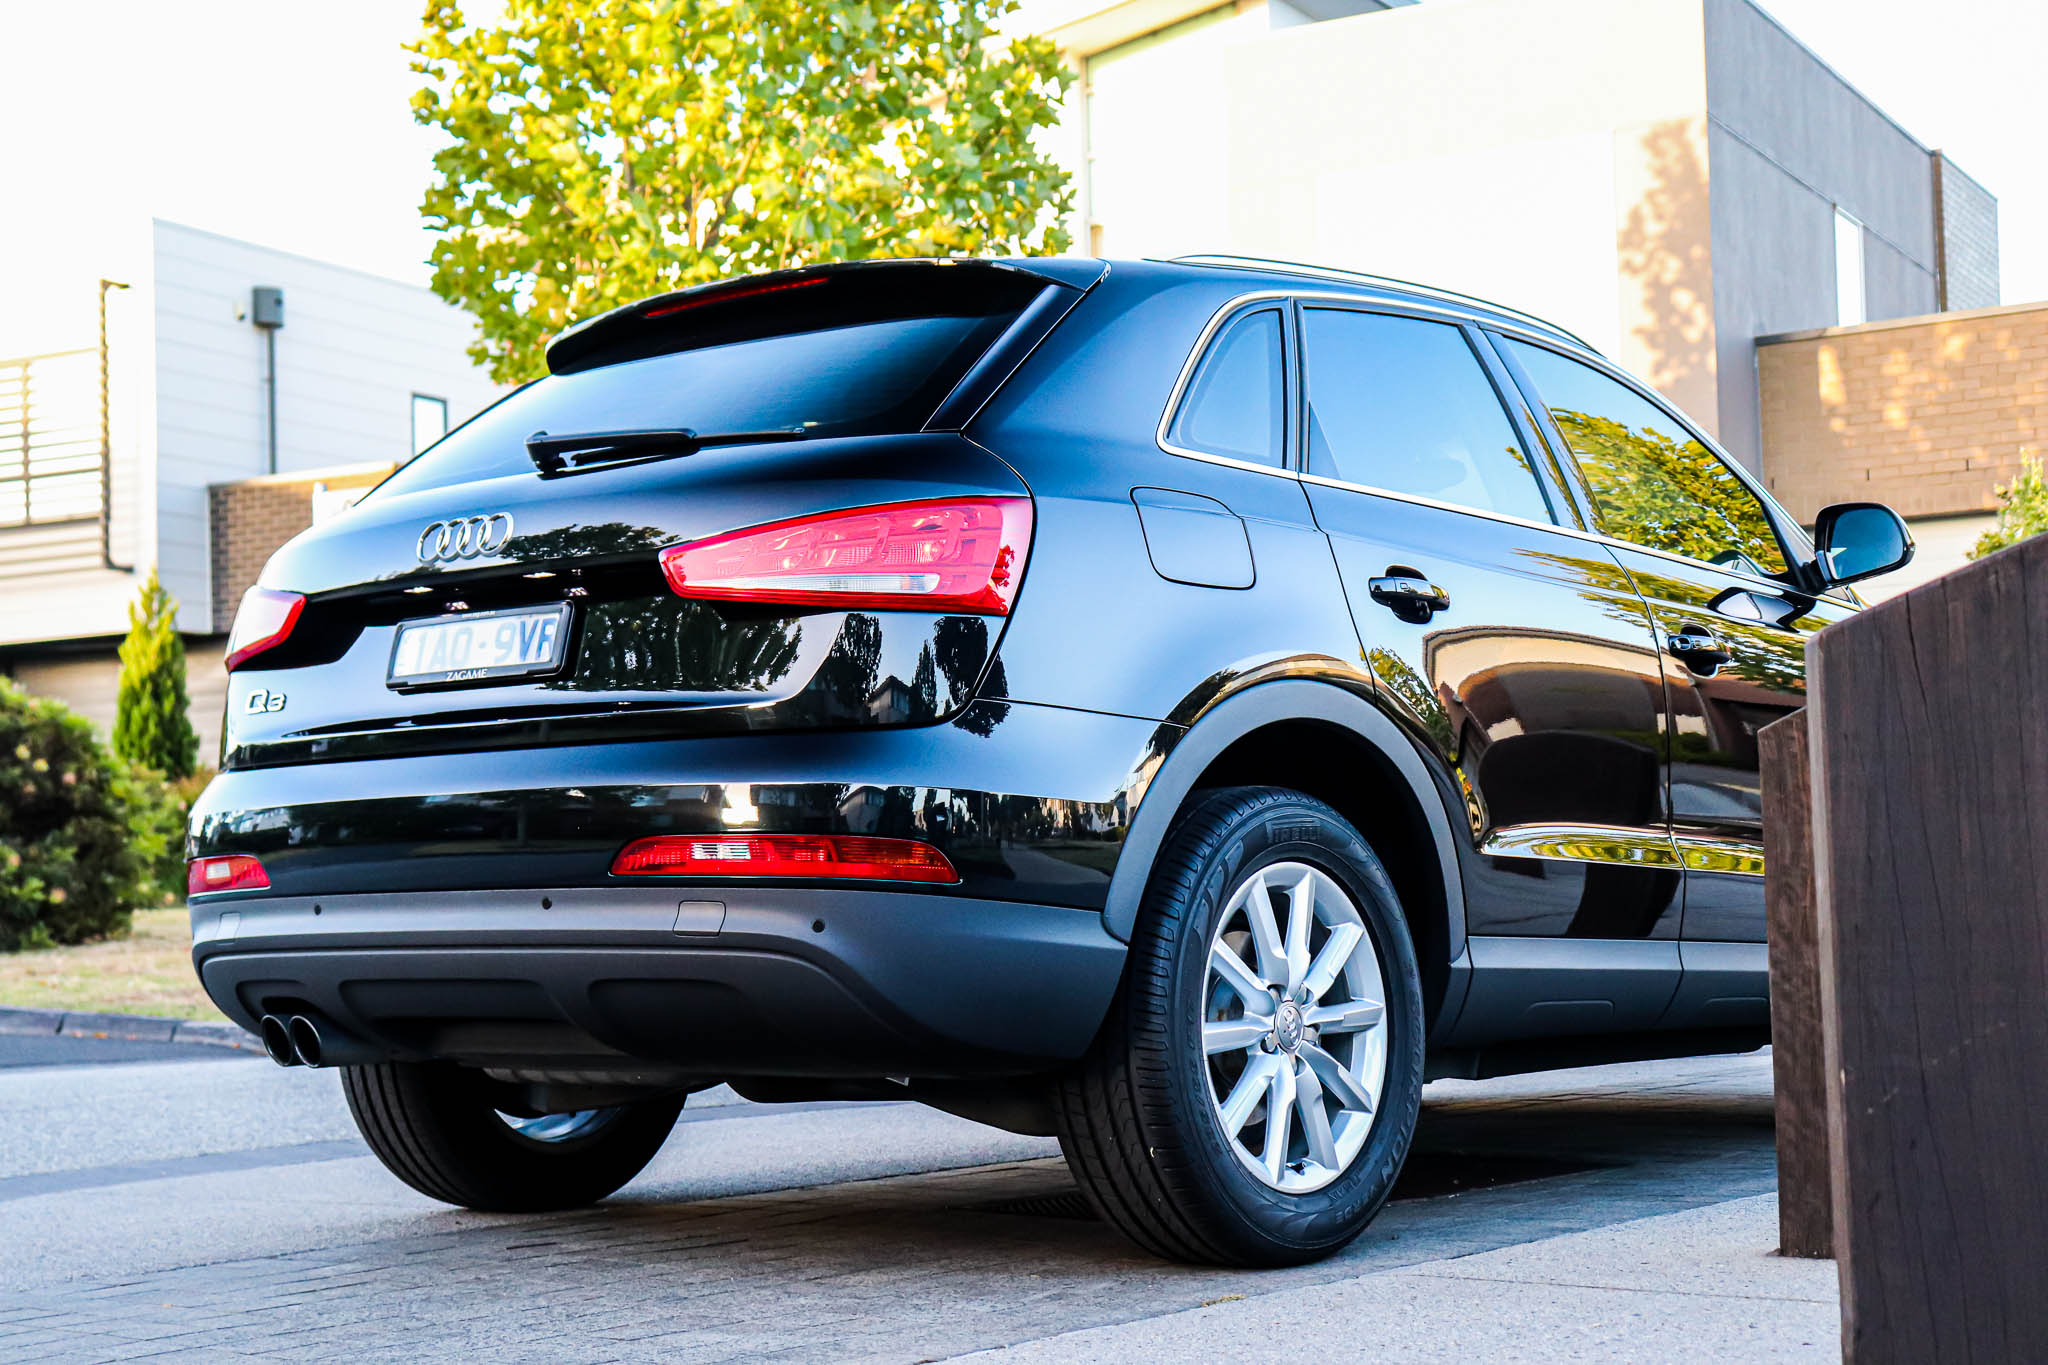 2014 Audi Q3 TFSI Auto - Find Me Cars